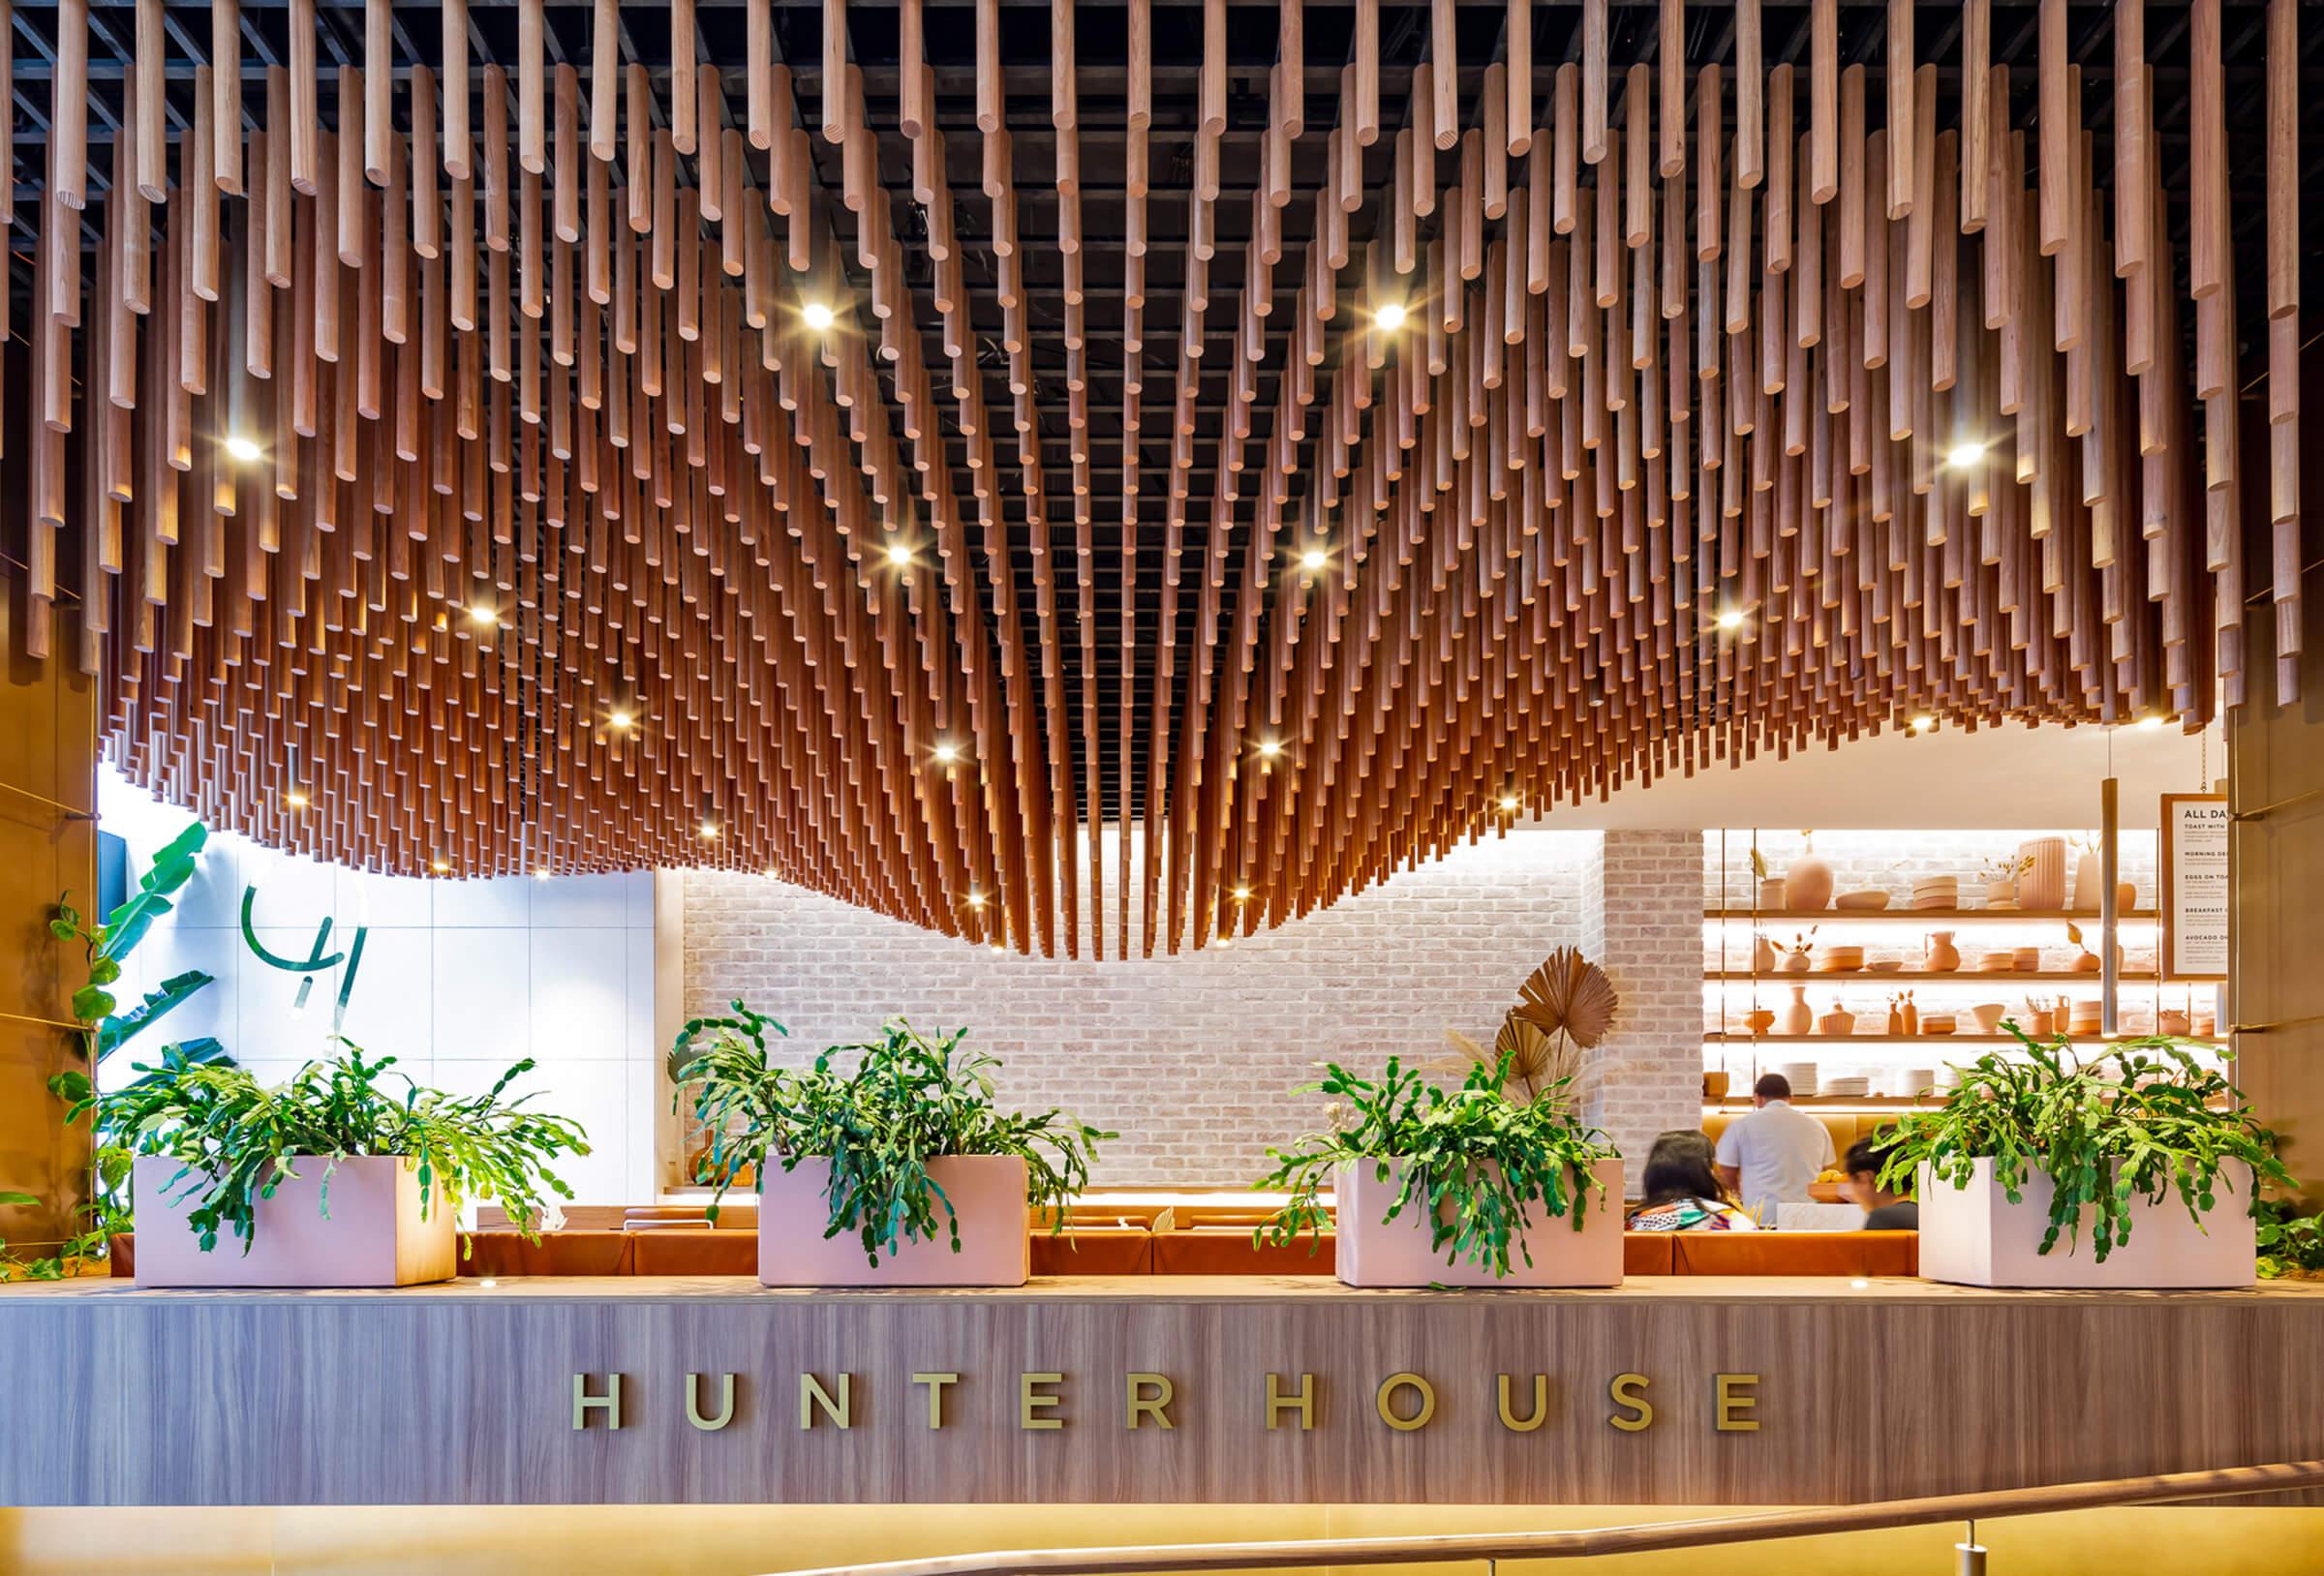 Hunter House Cafe Sculptform